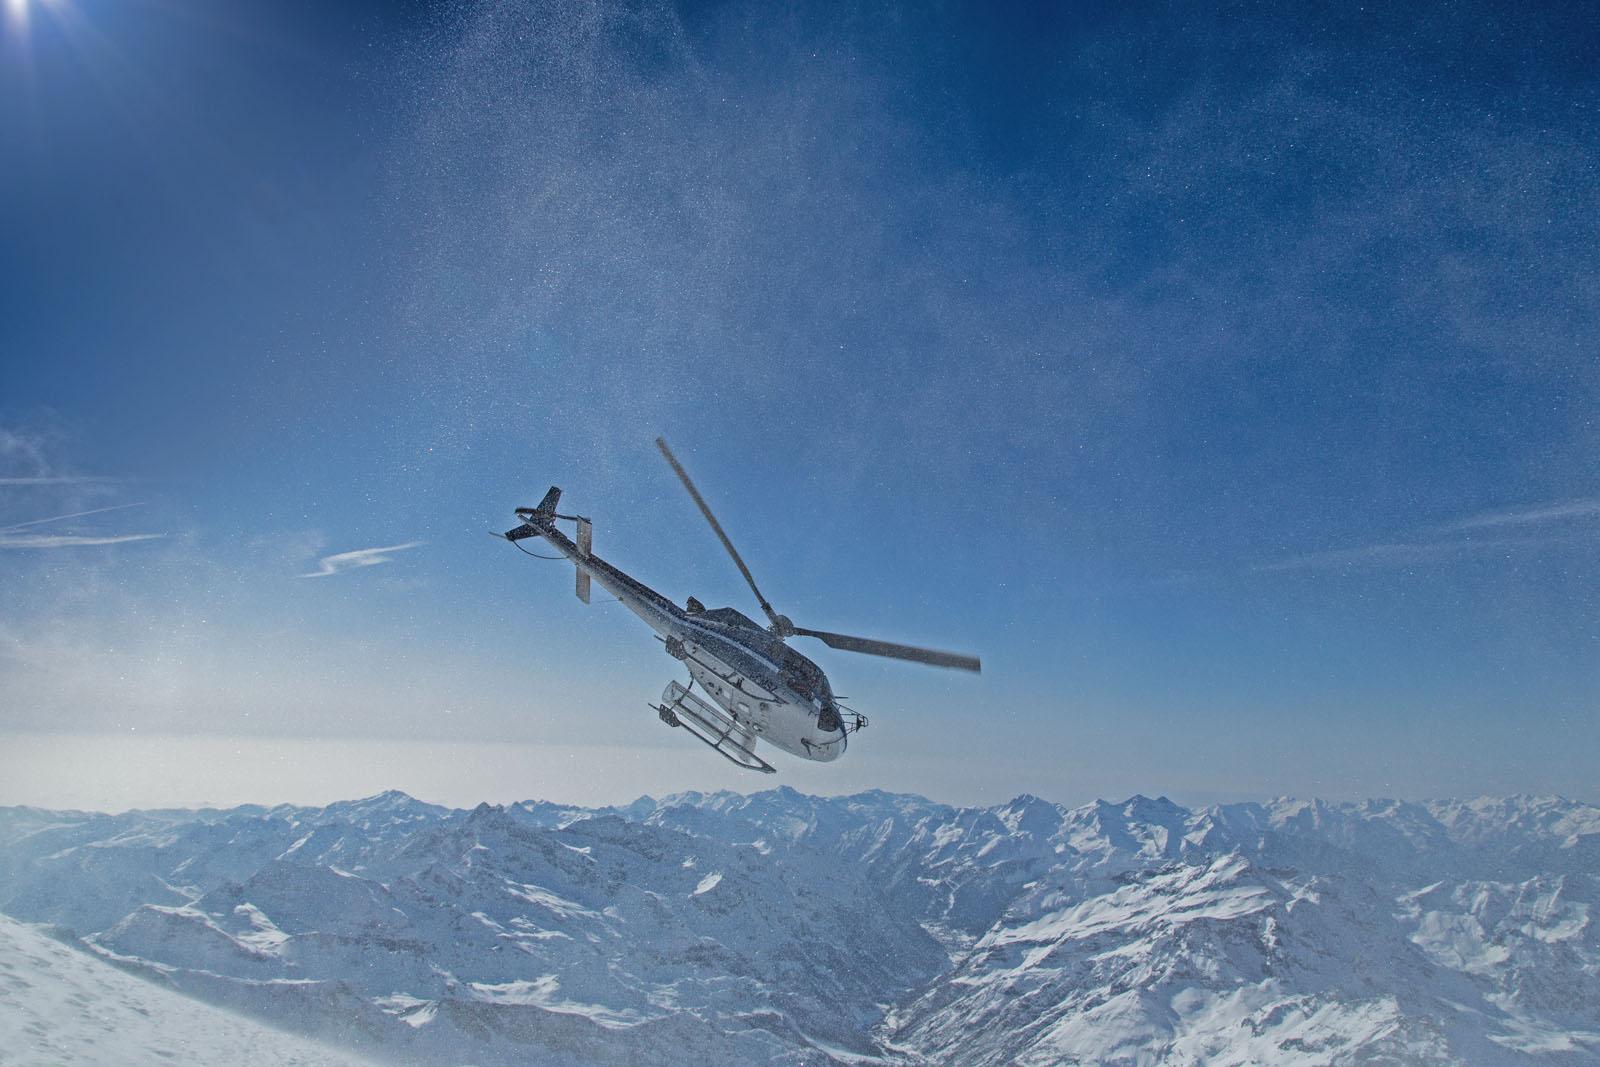 zuba-ski-gressoney-my-first-heliski-day-002.jpg